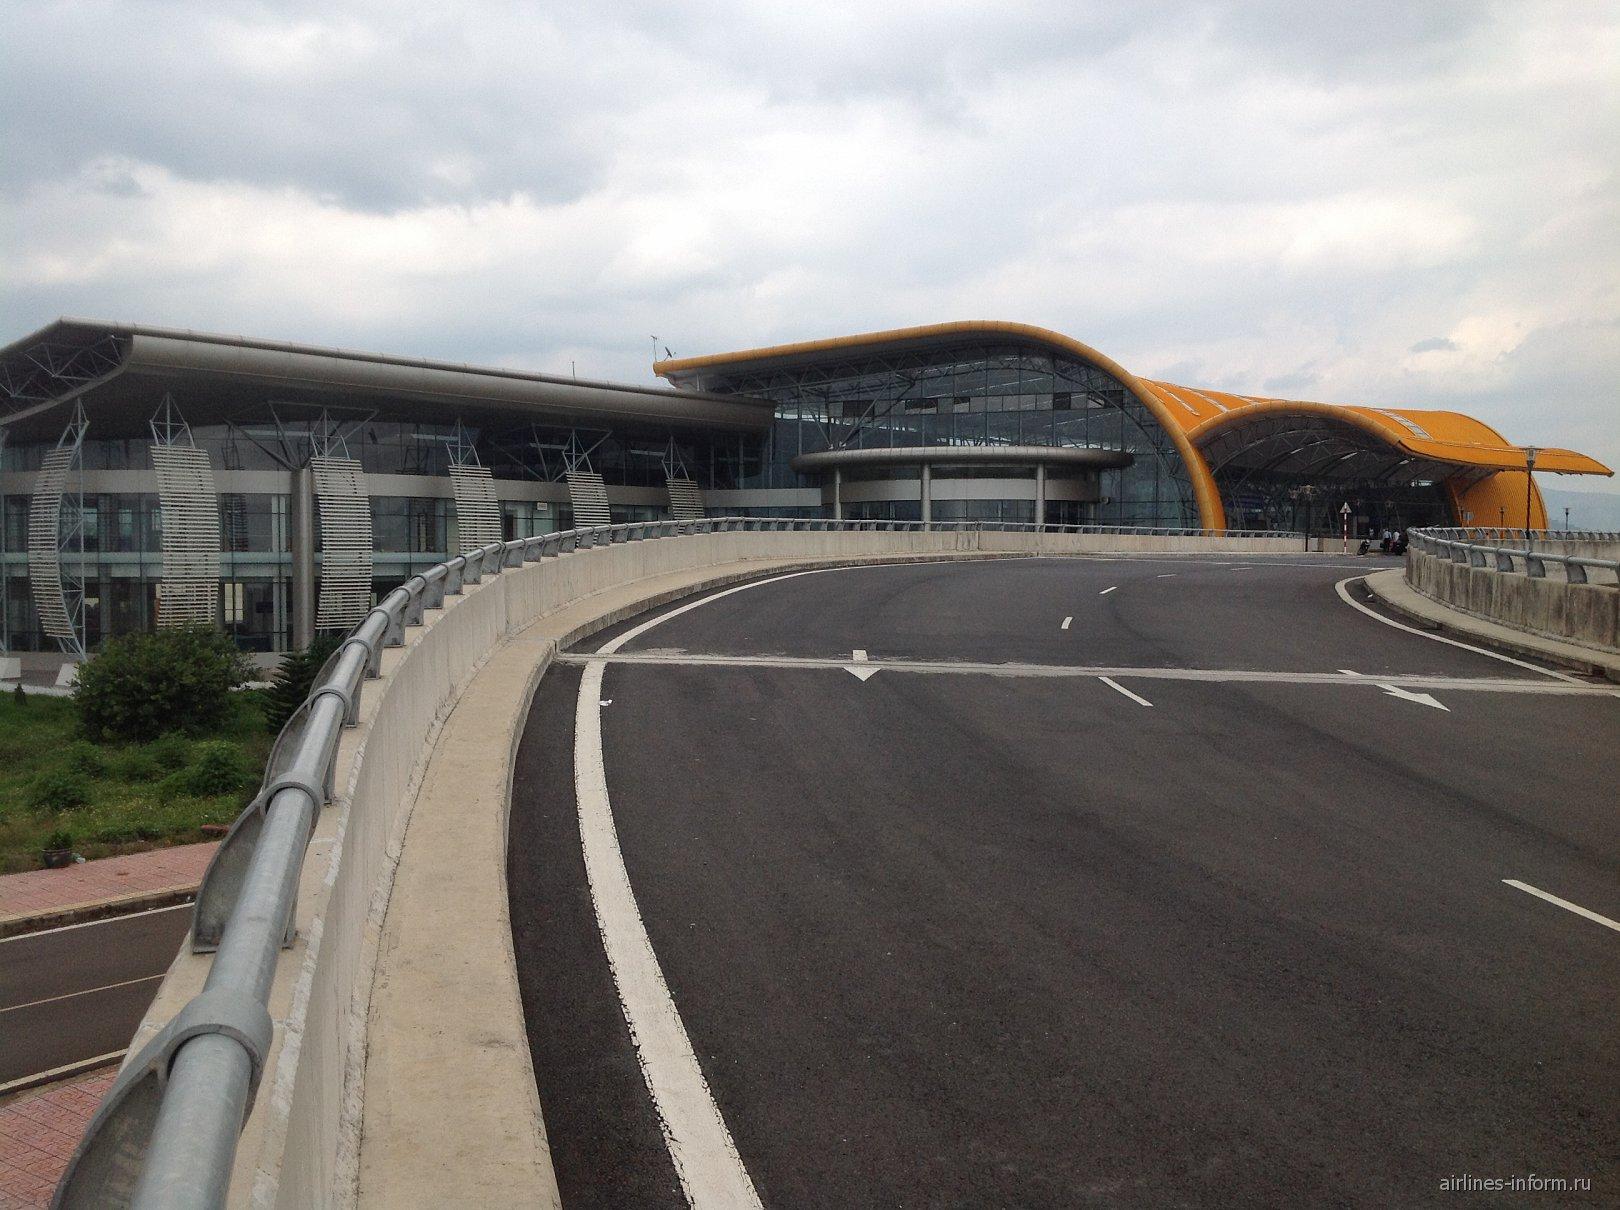 Аэровокзал аэропорта Далат Льенкхыонг